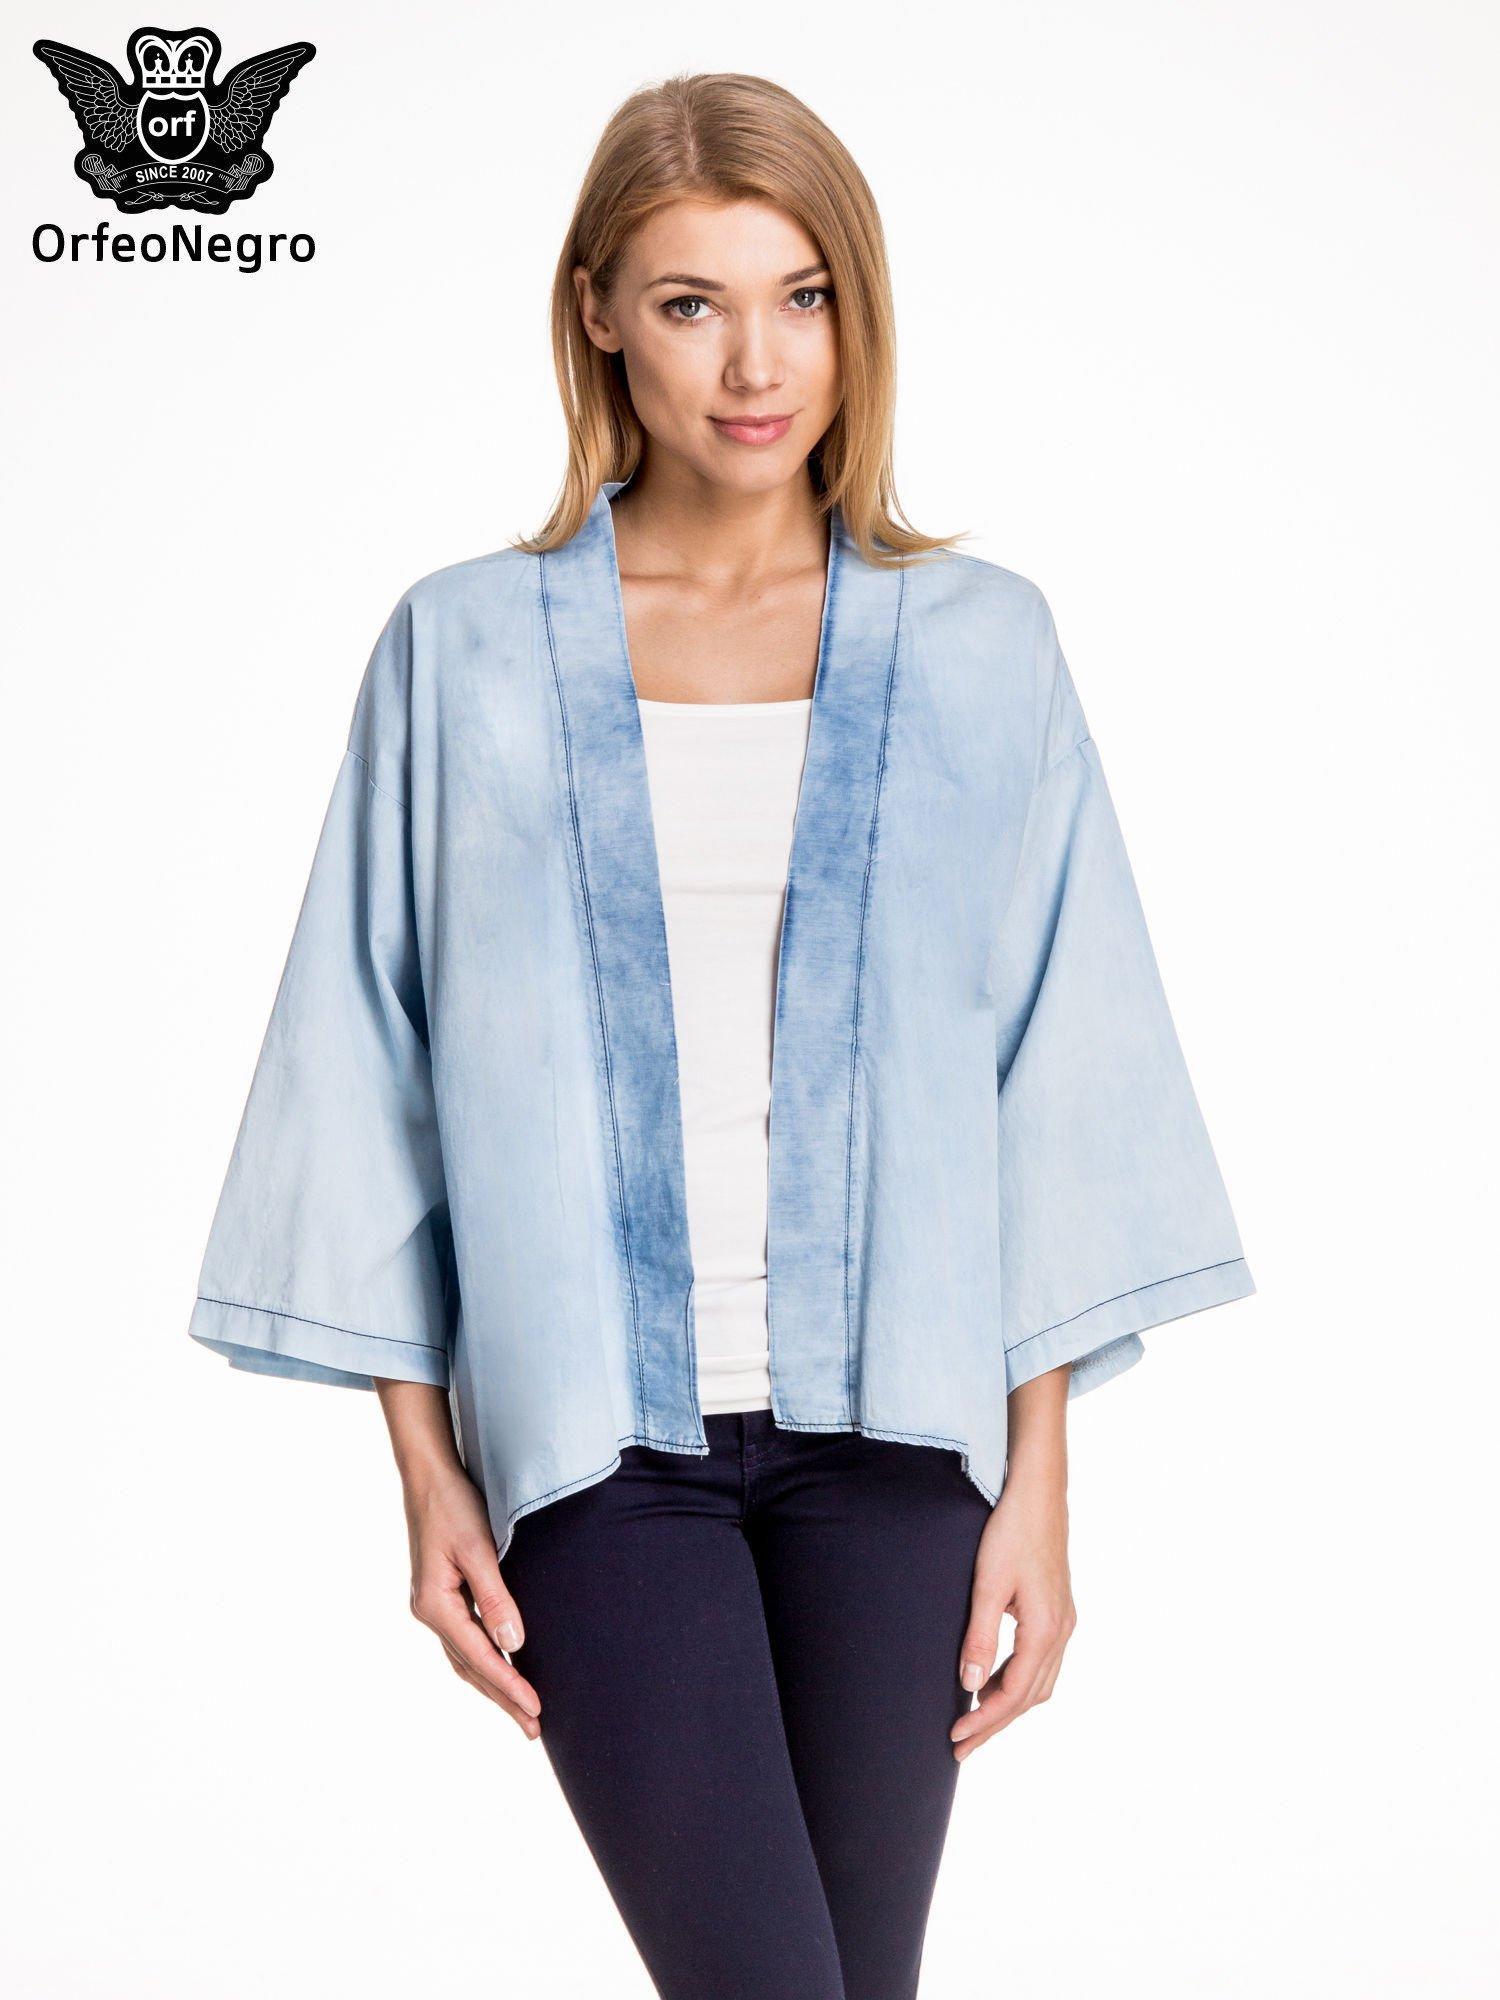 Jeansowa koszula narzutka o kroju kimono                                  zdj.                                  1